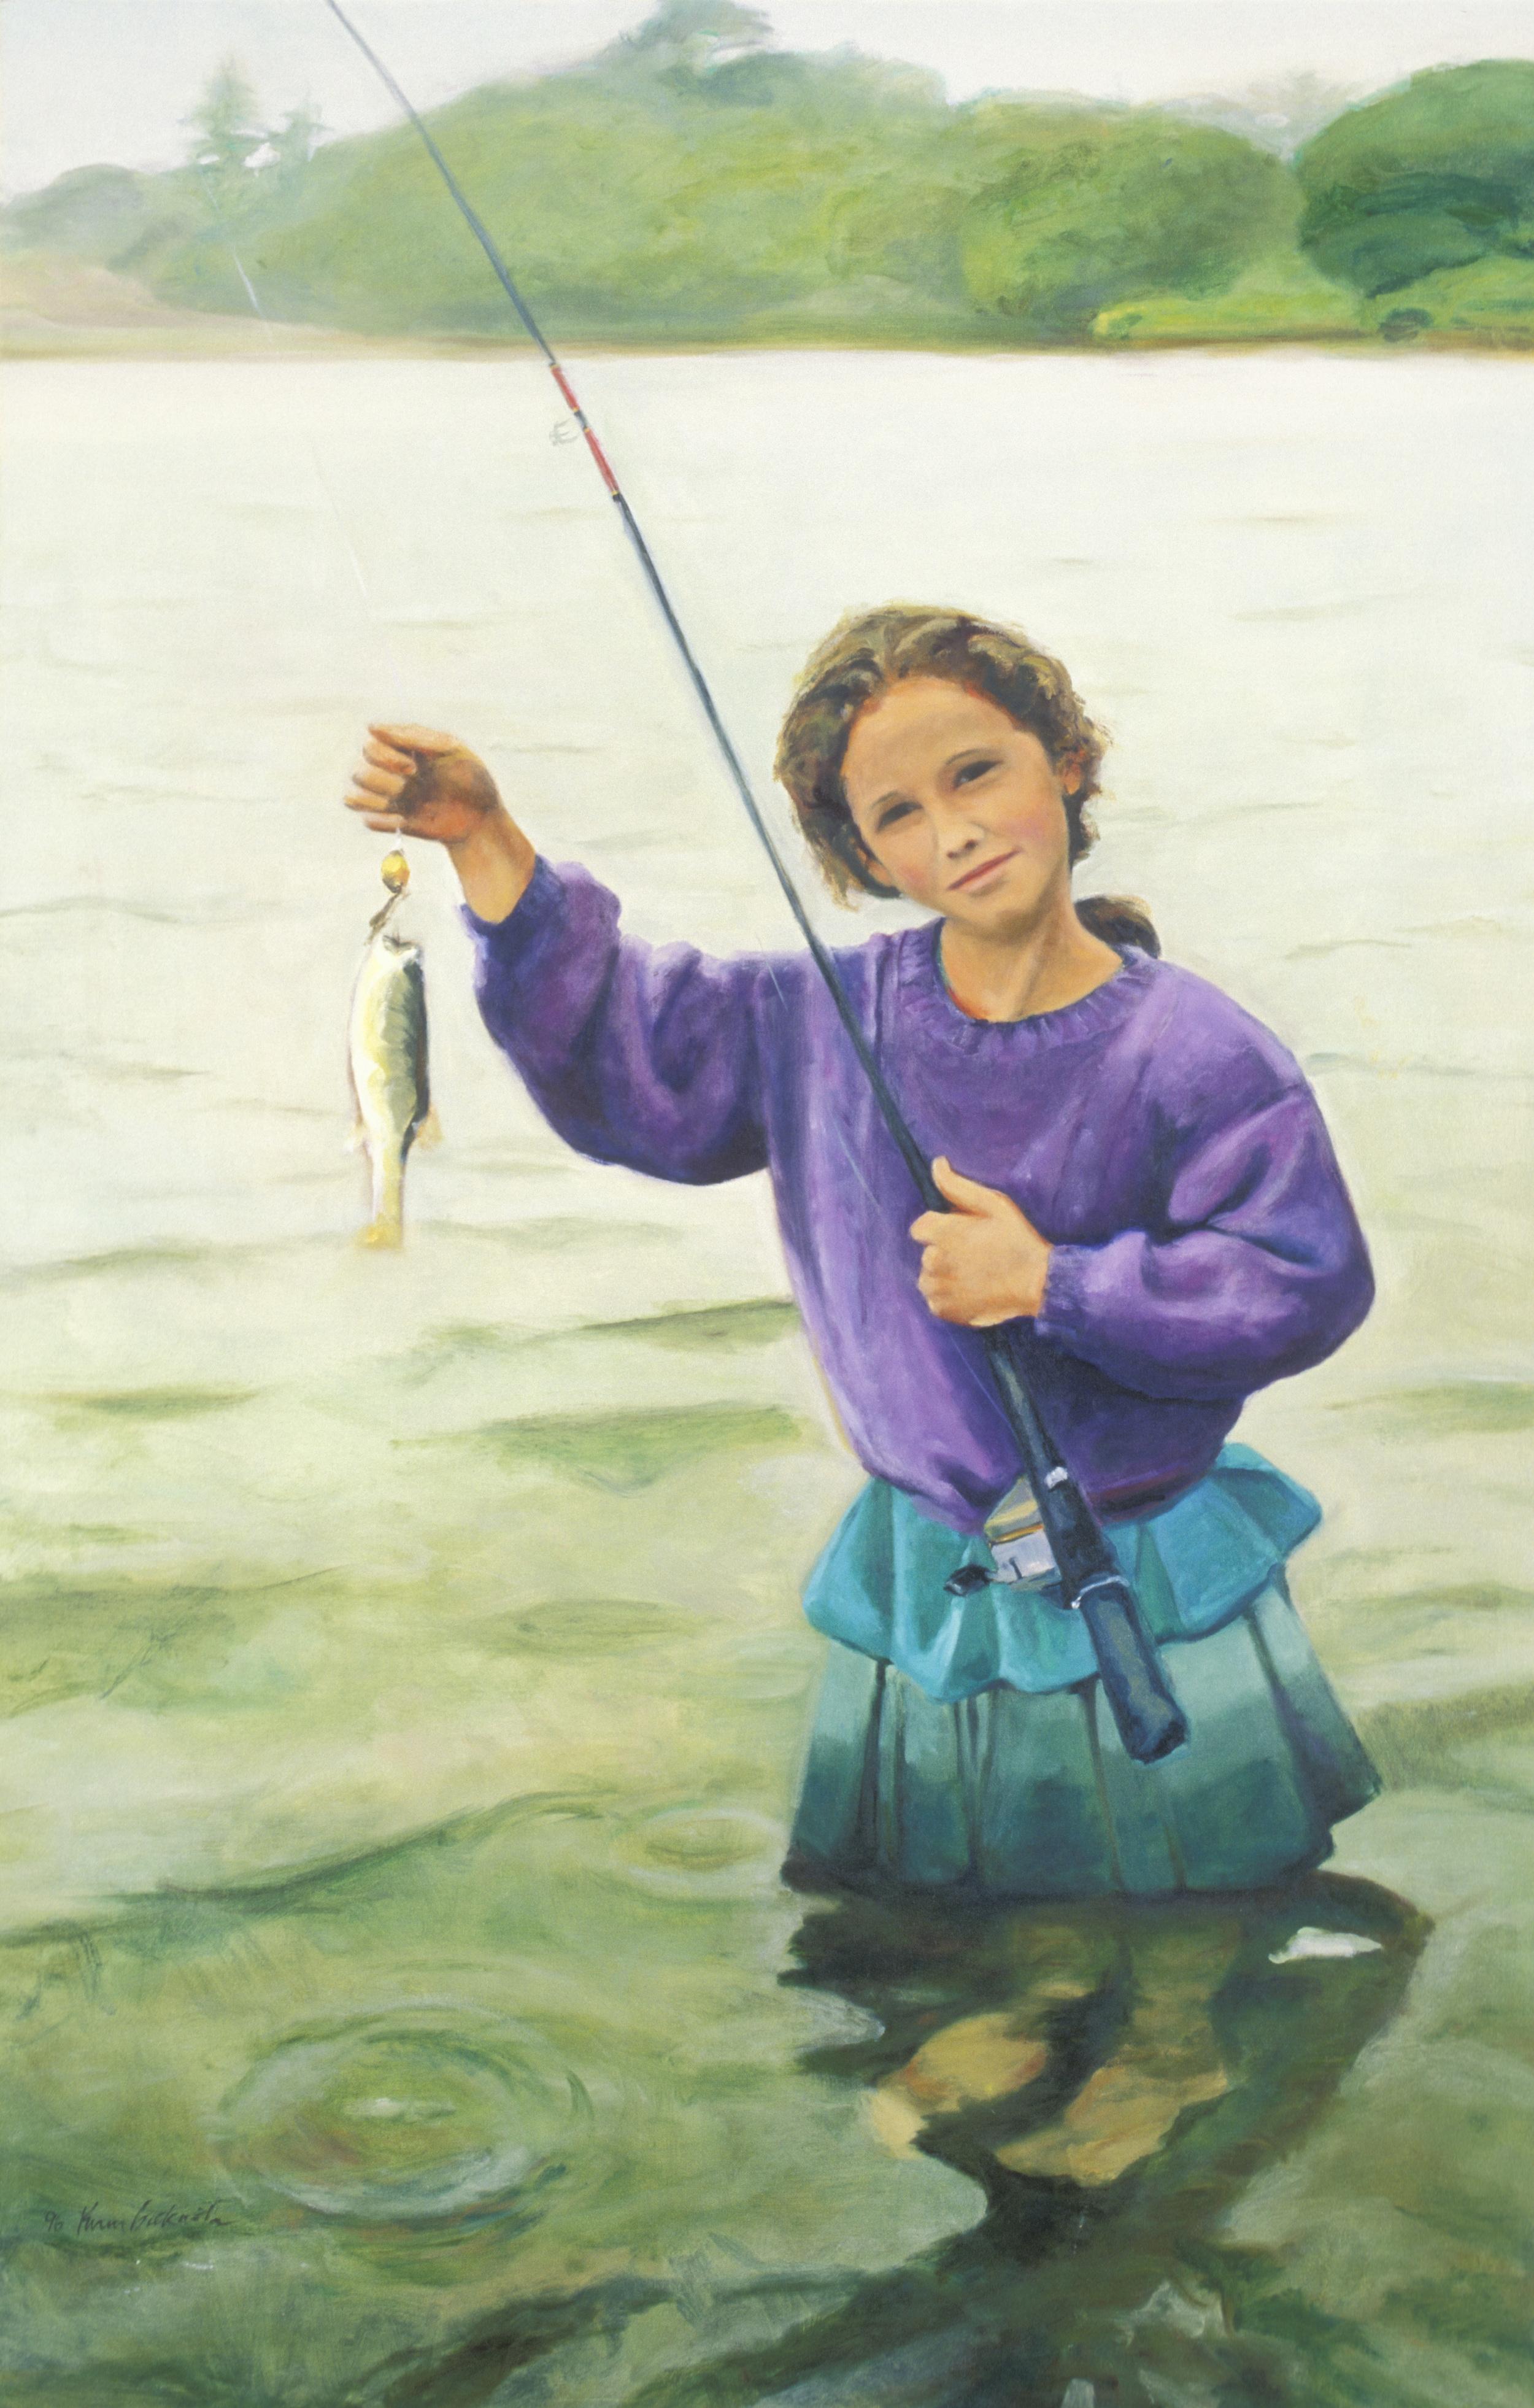 06_pond_fishing.jpg